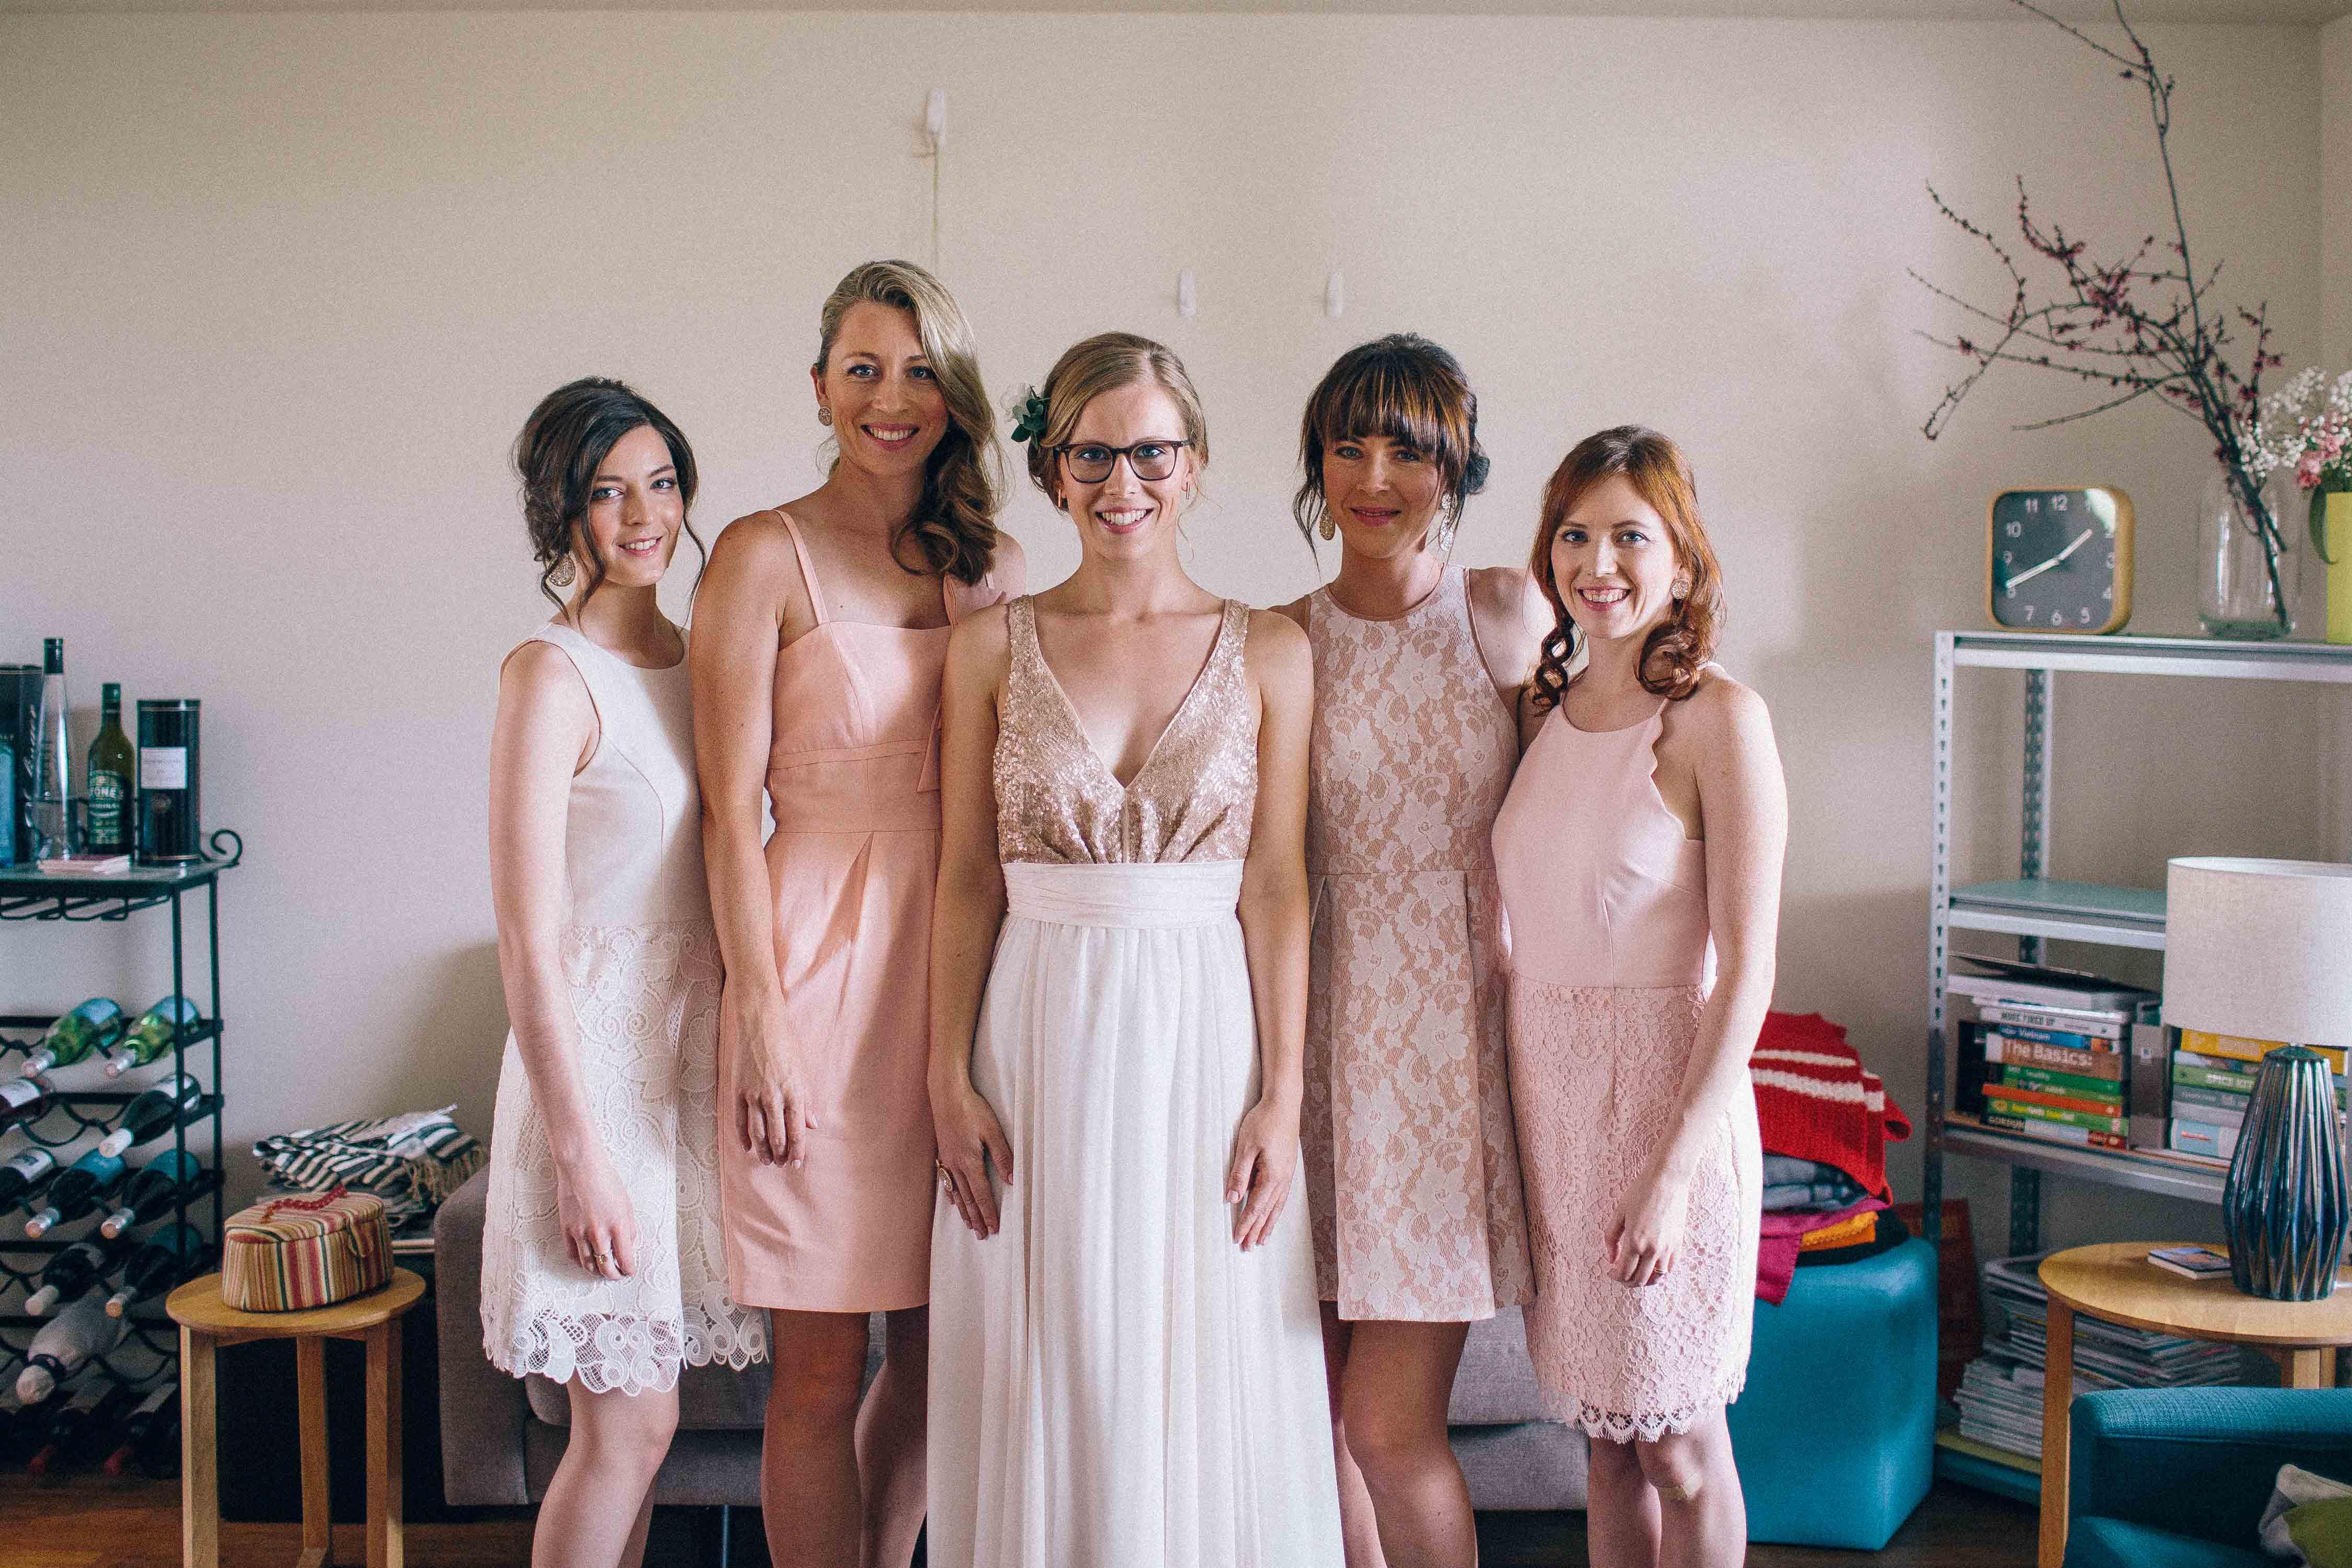 elise&liam-wedding-sonjacphotography-highres-180